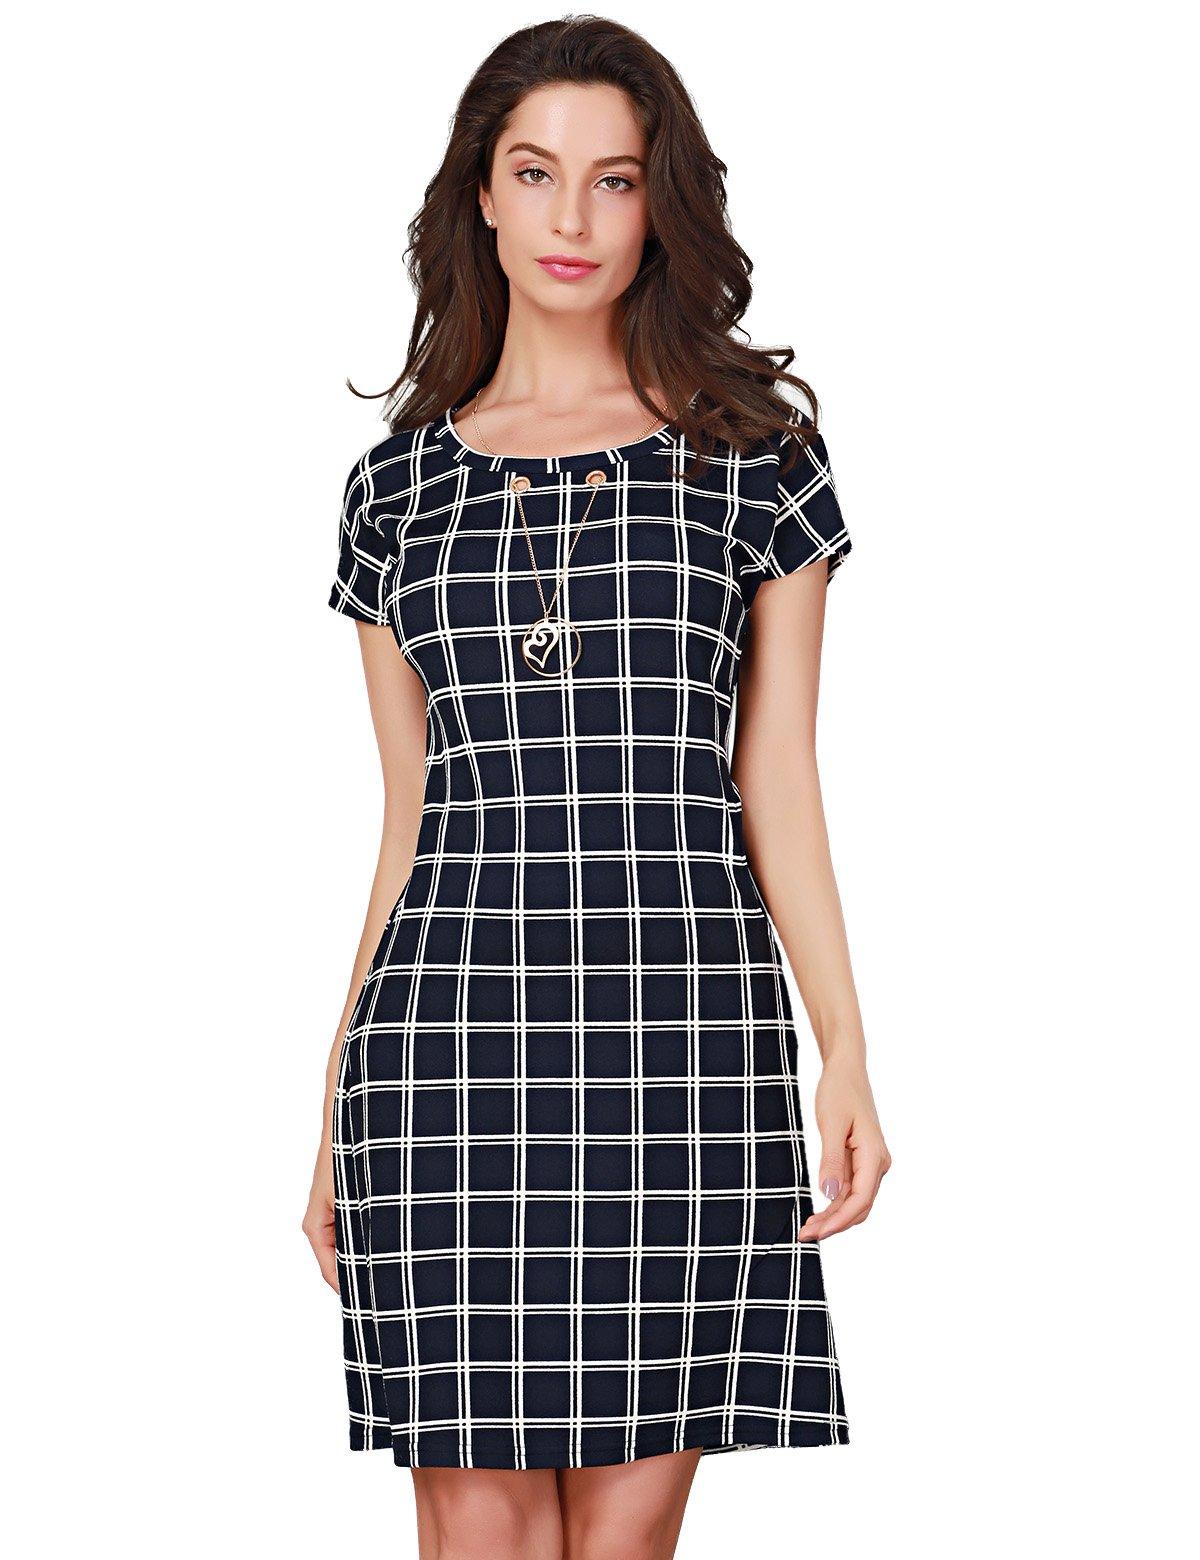 Triplewood Women's Elegant Short Sleeve Wear to Work Casual Business Check Dress Pocket